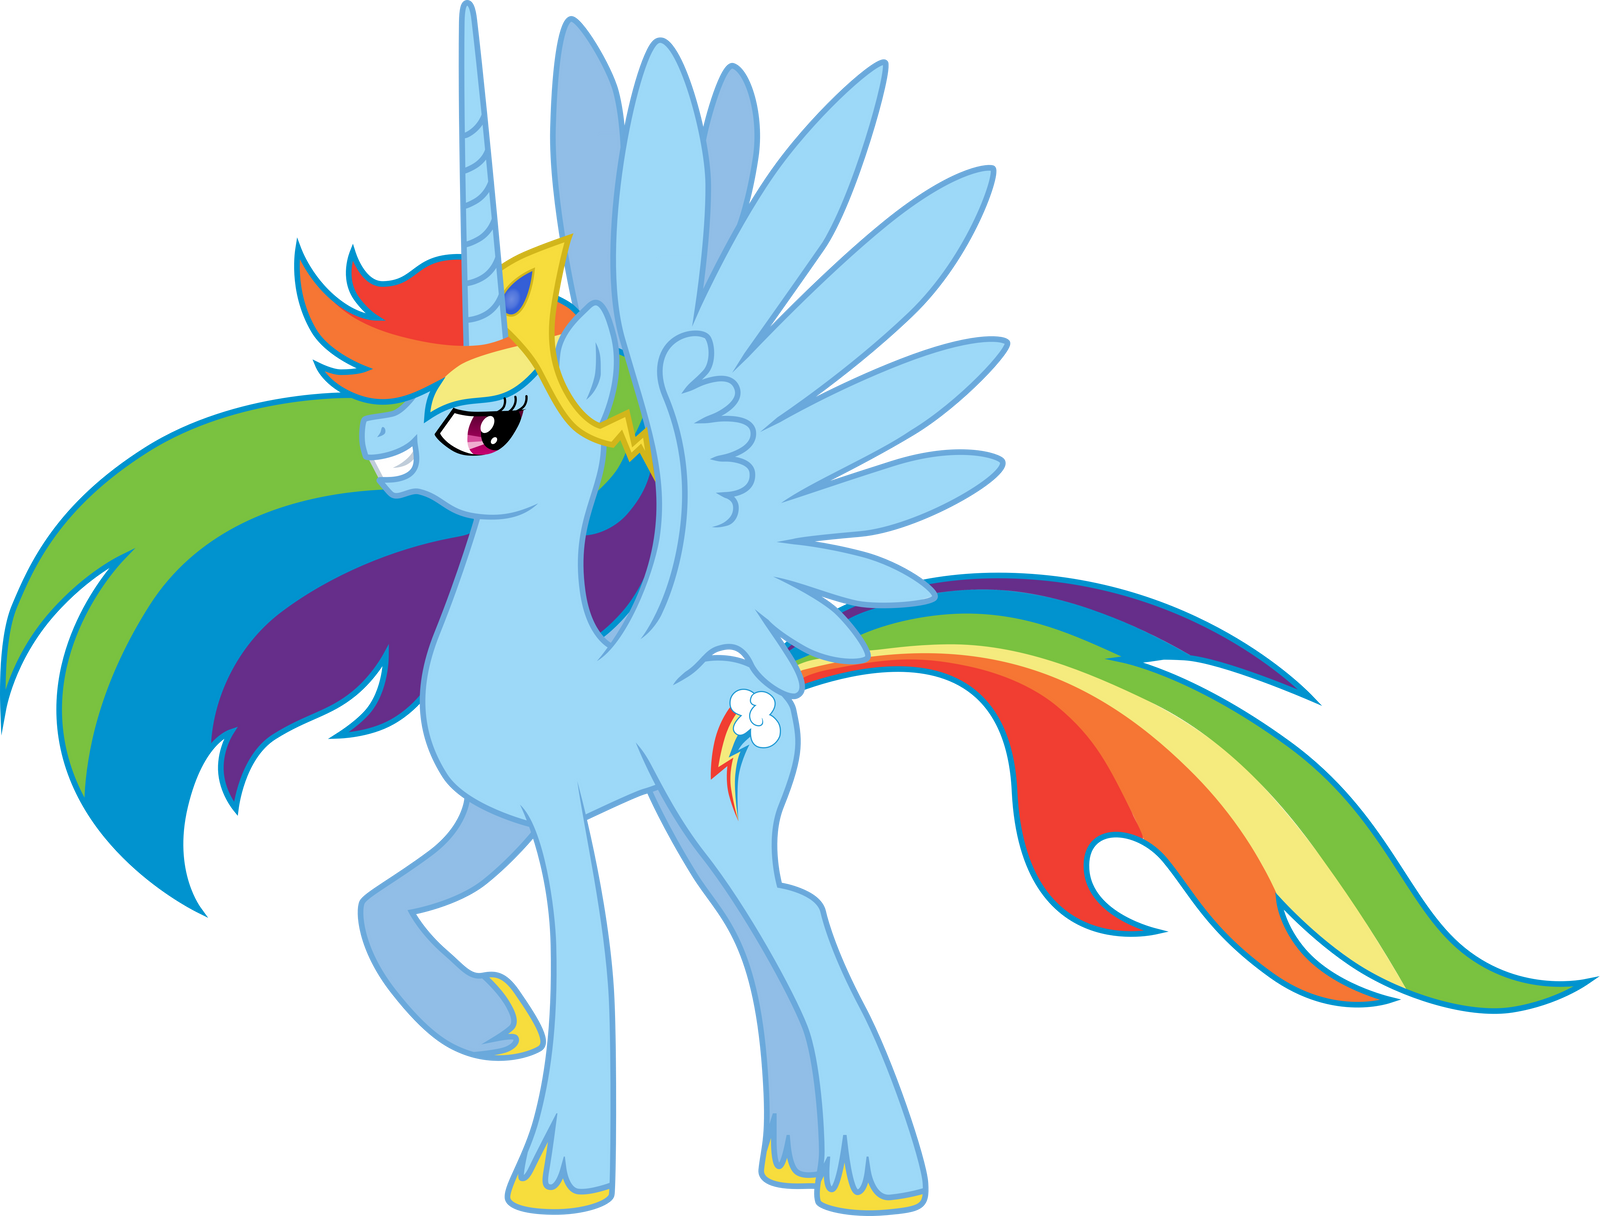 Princess Rainbow by Chimajra on DeviantArt